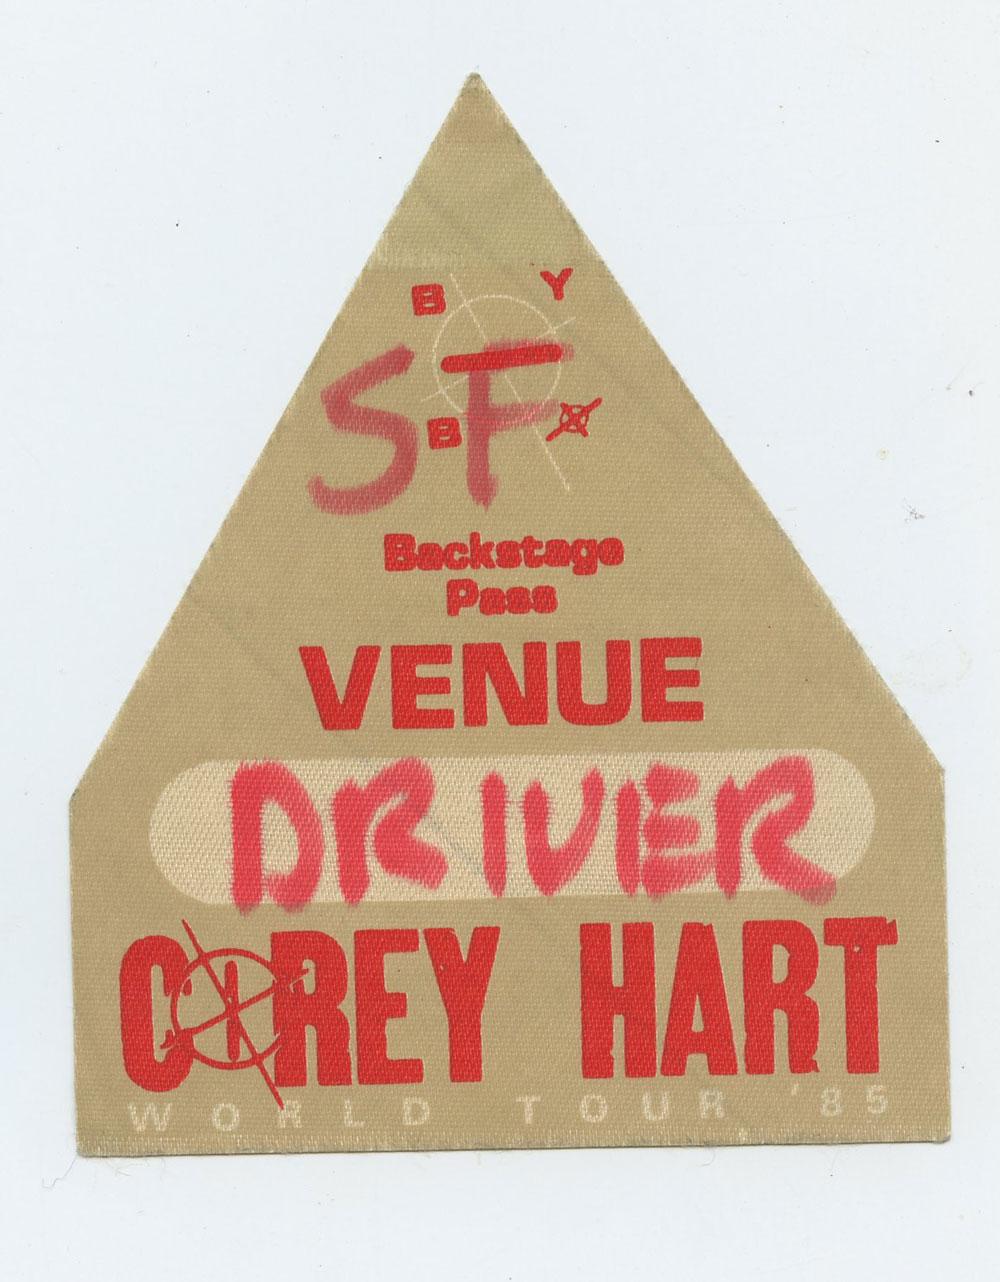 Corey Hart 1987 World Tour Backstage Pass